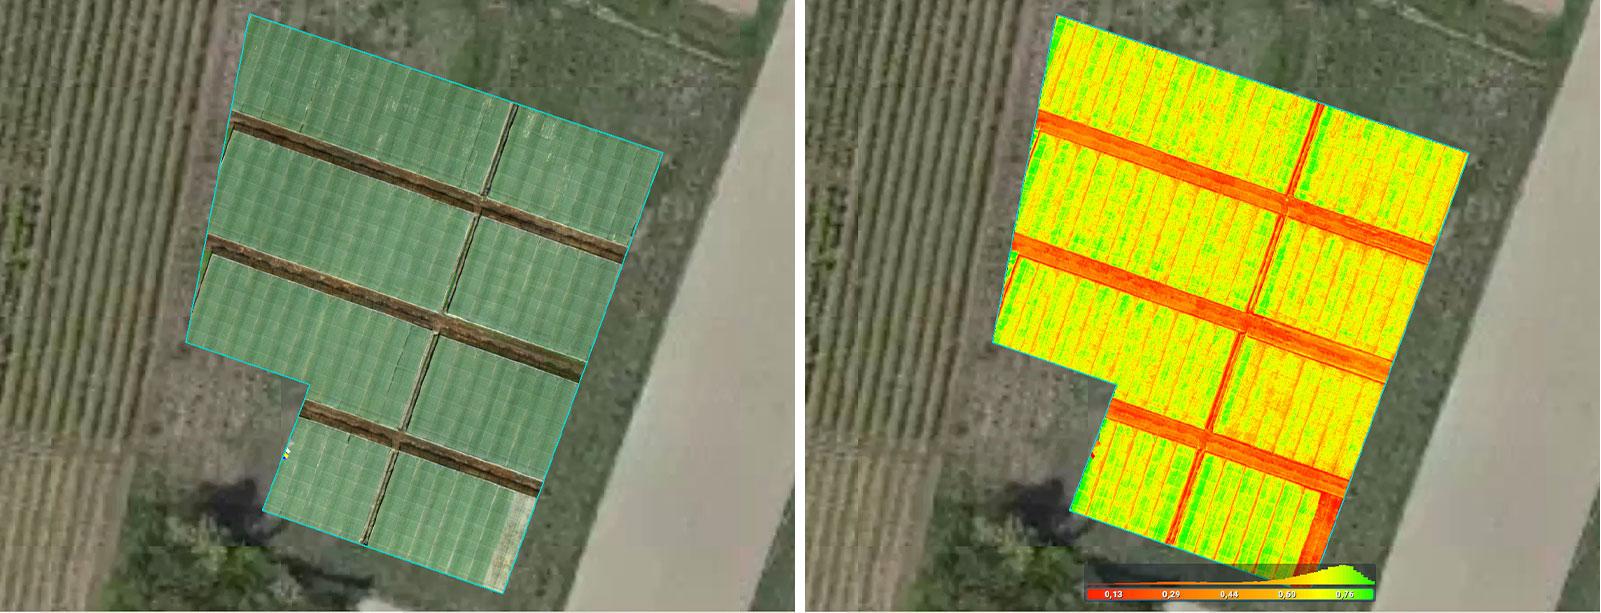 strawberry nursery mapping in Pix4Dfields